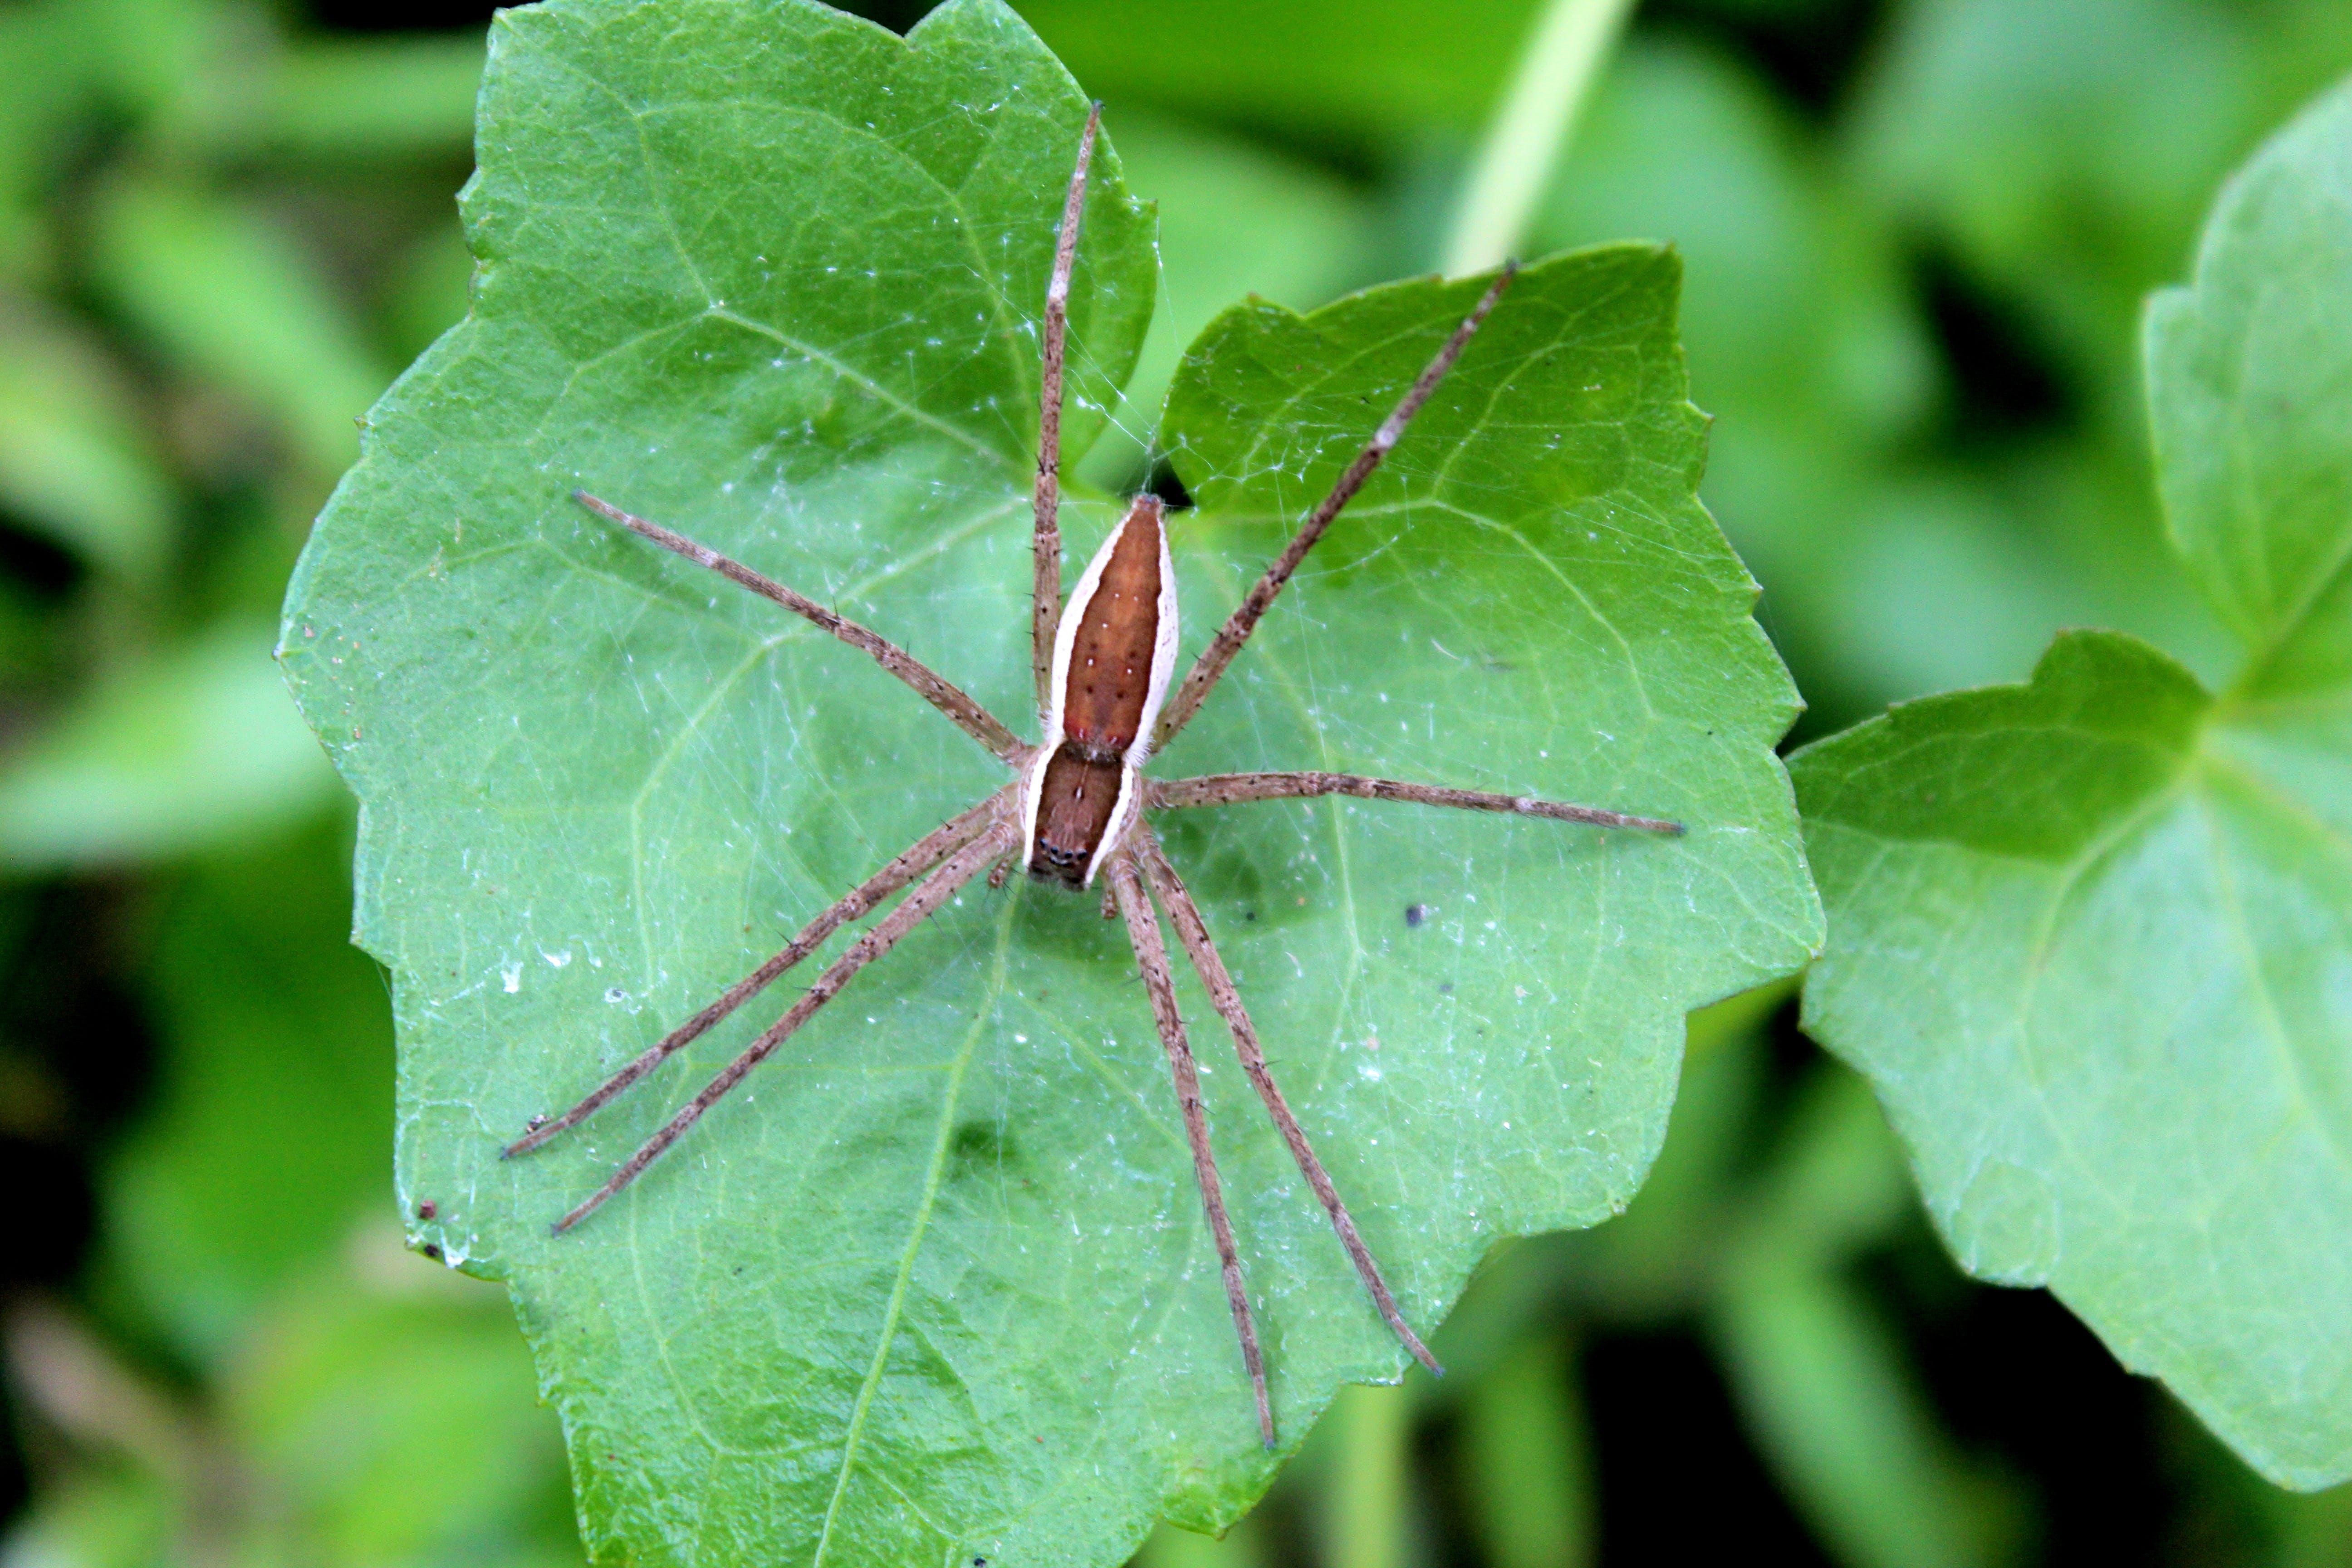 Brown Spider on Green Cordate Leaf